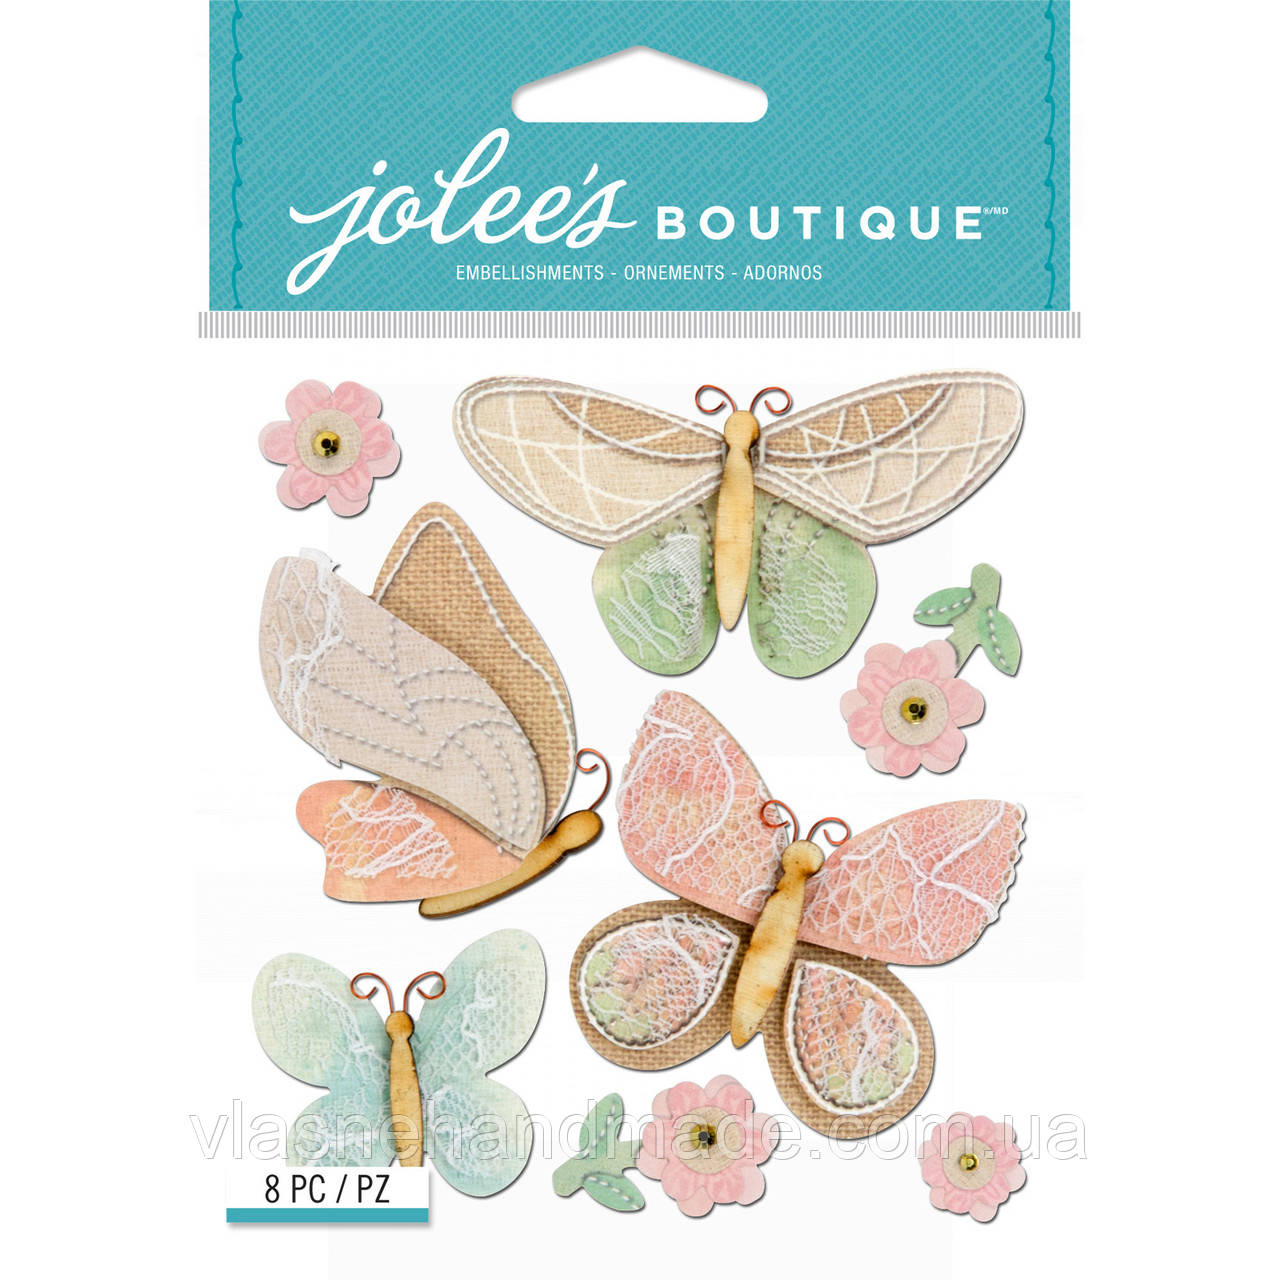 Наклейки 3D - BEAUTIFUL BUTTERFLIES - Jolee's Boutique - 8 шт.